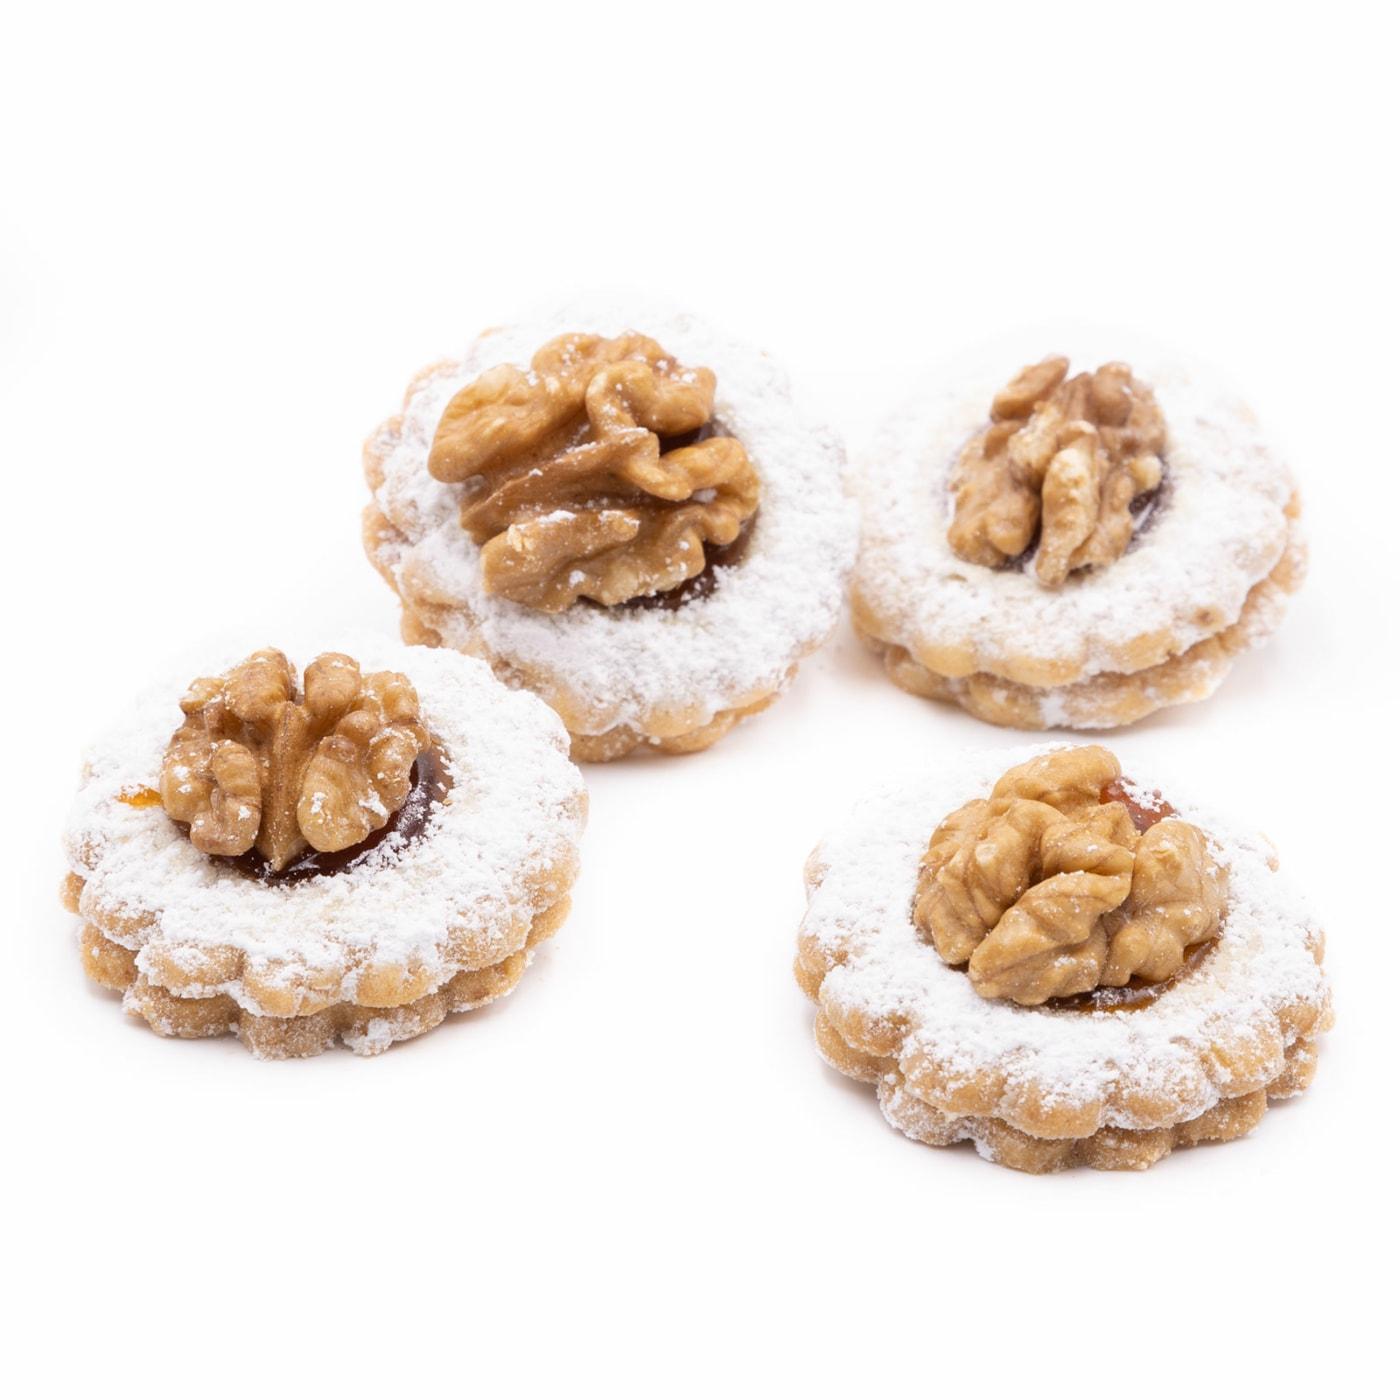 Walnut rings